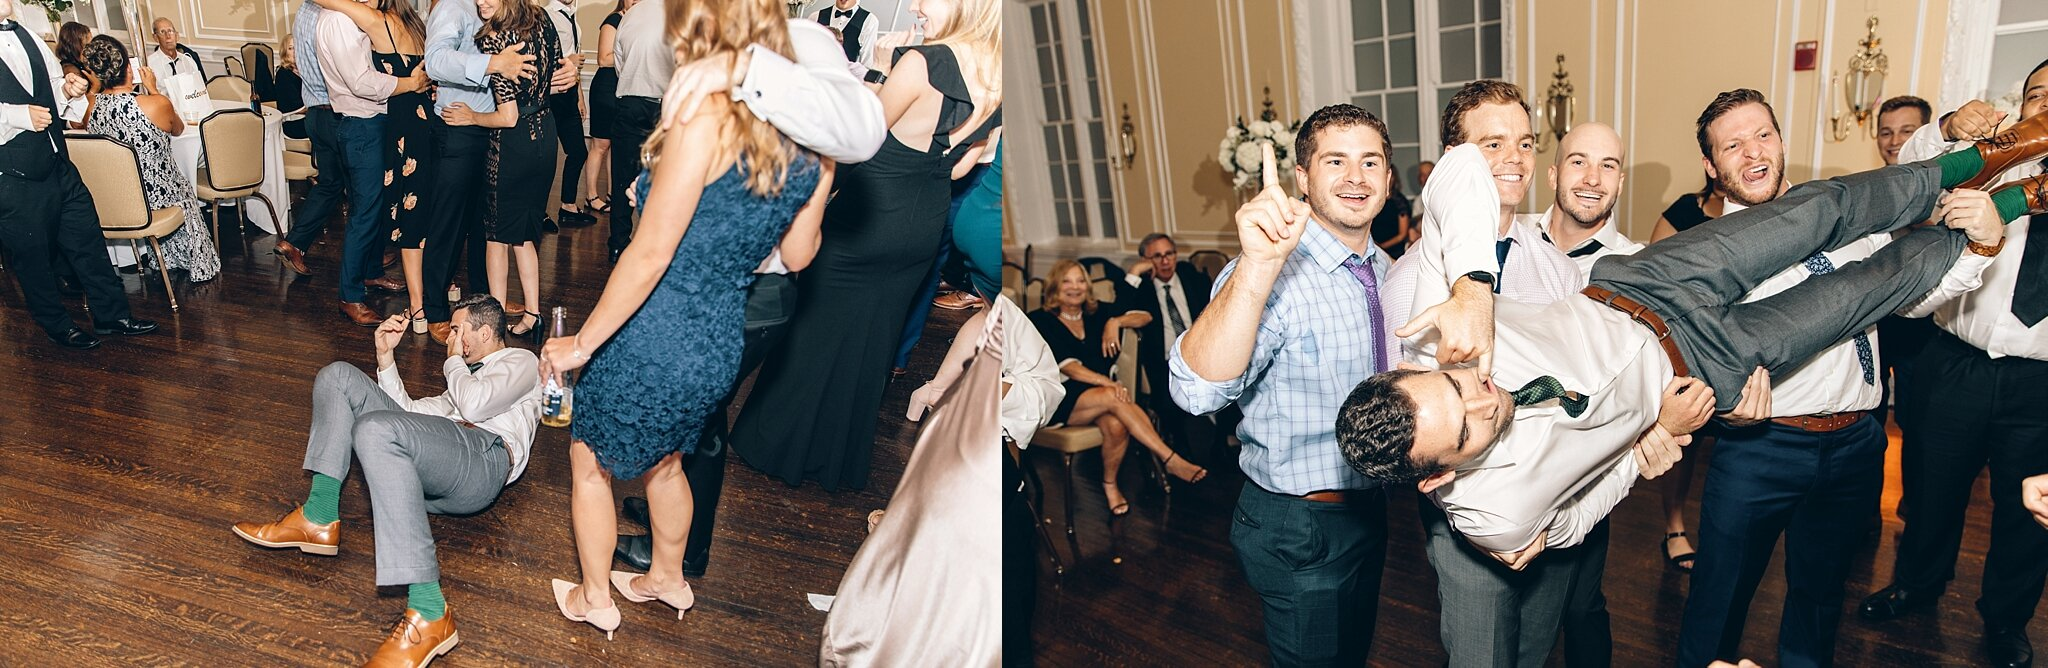 patrick-henry-ballroom-wedding-roanoke_0570.jpg